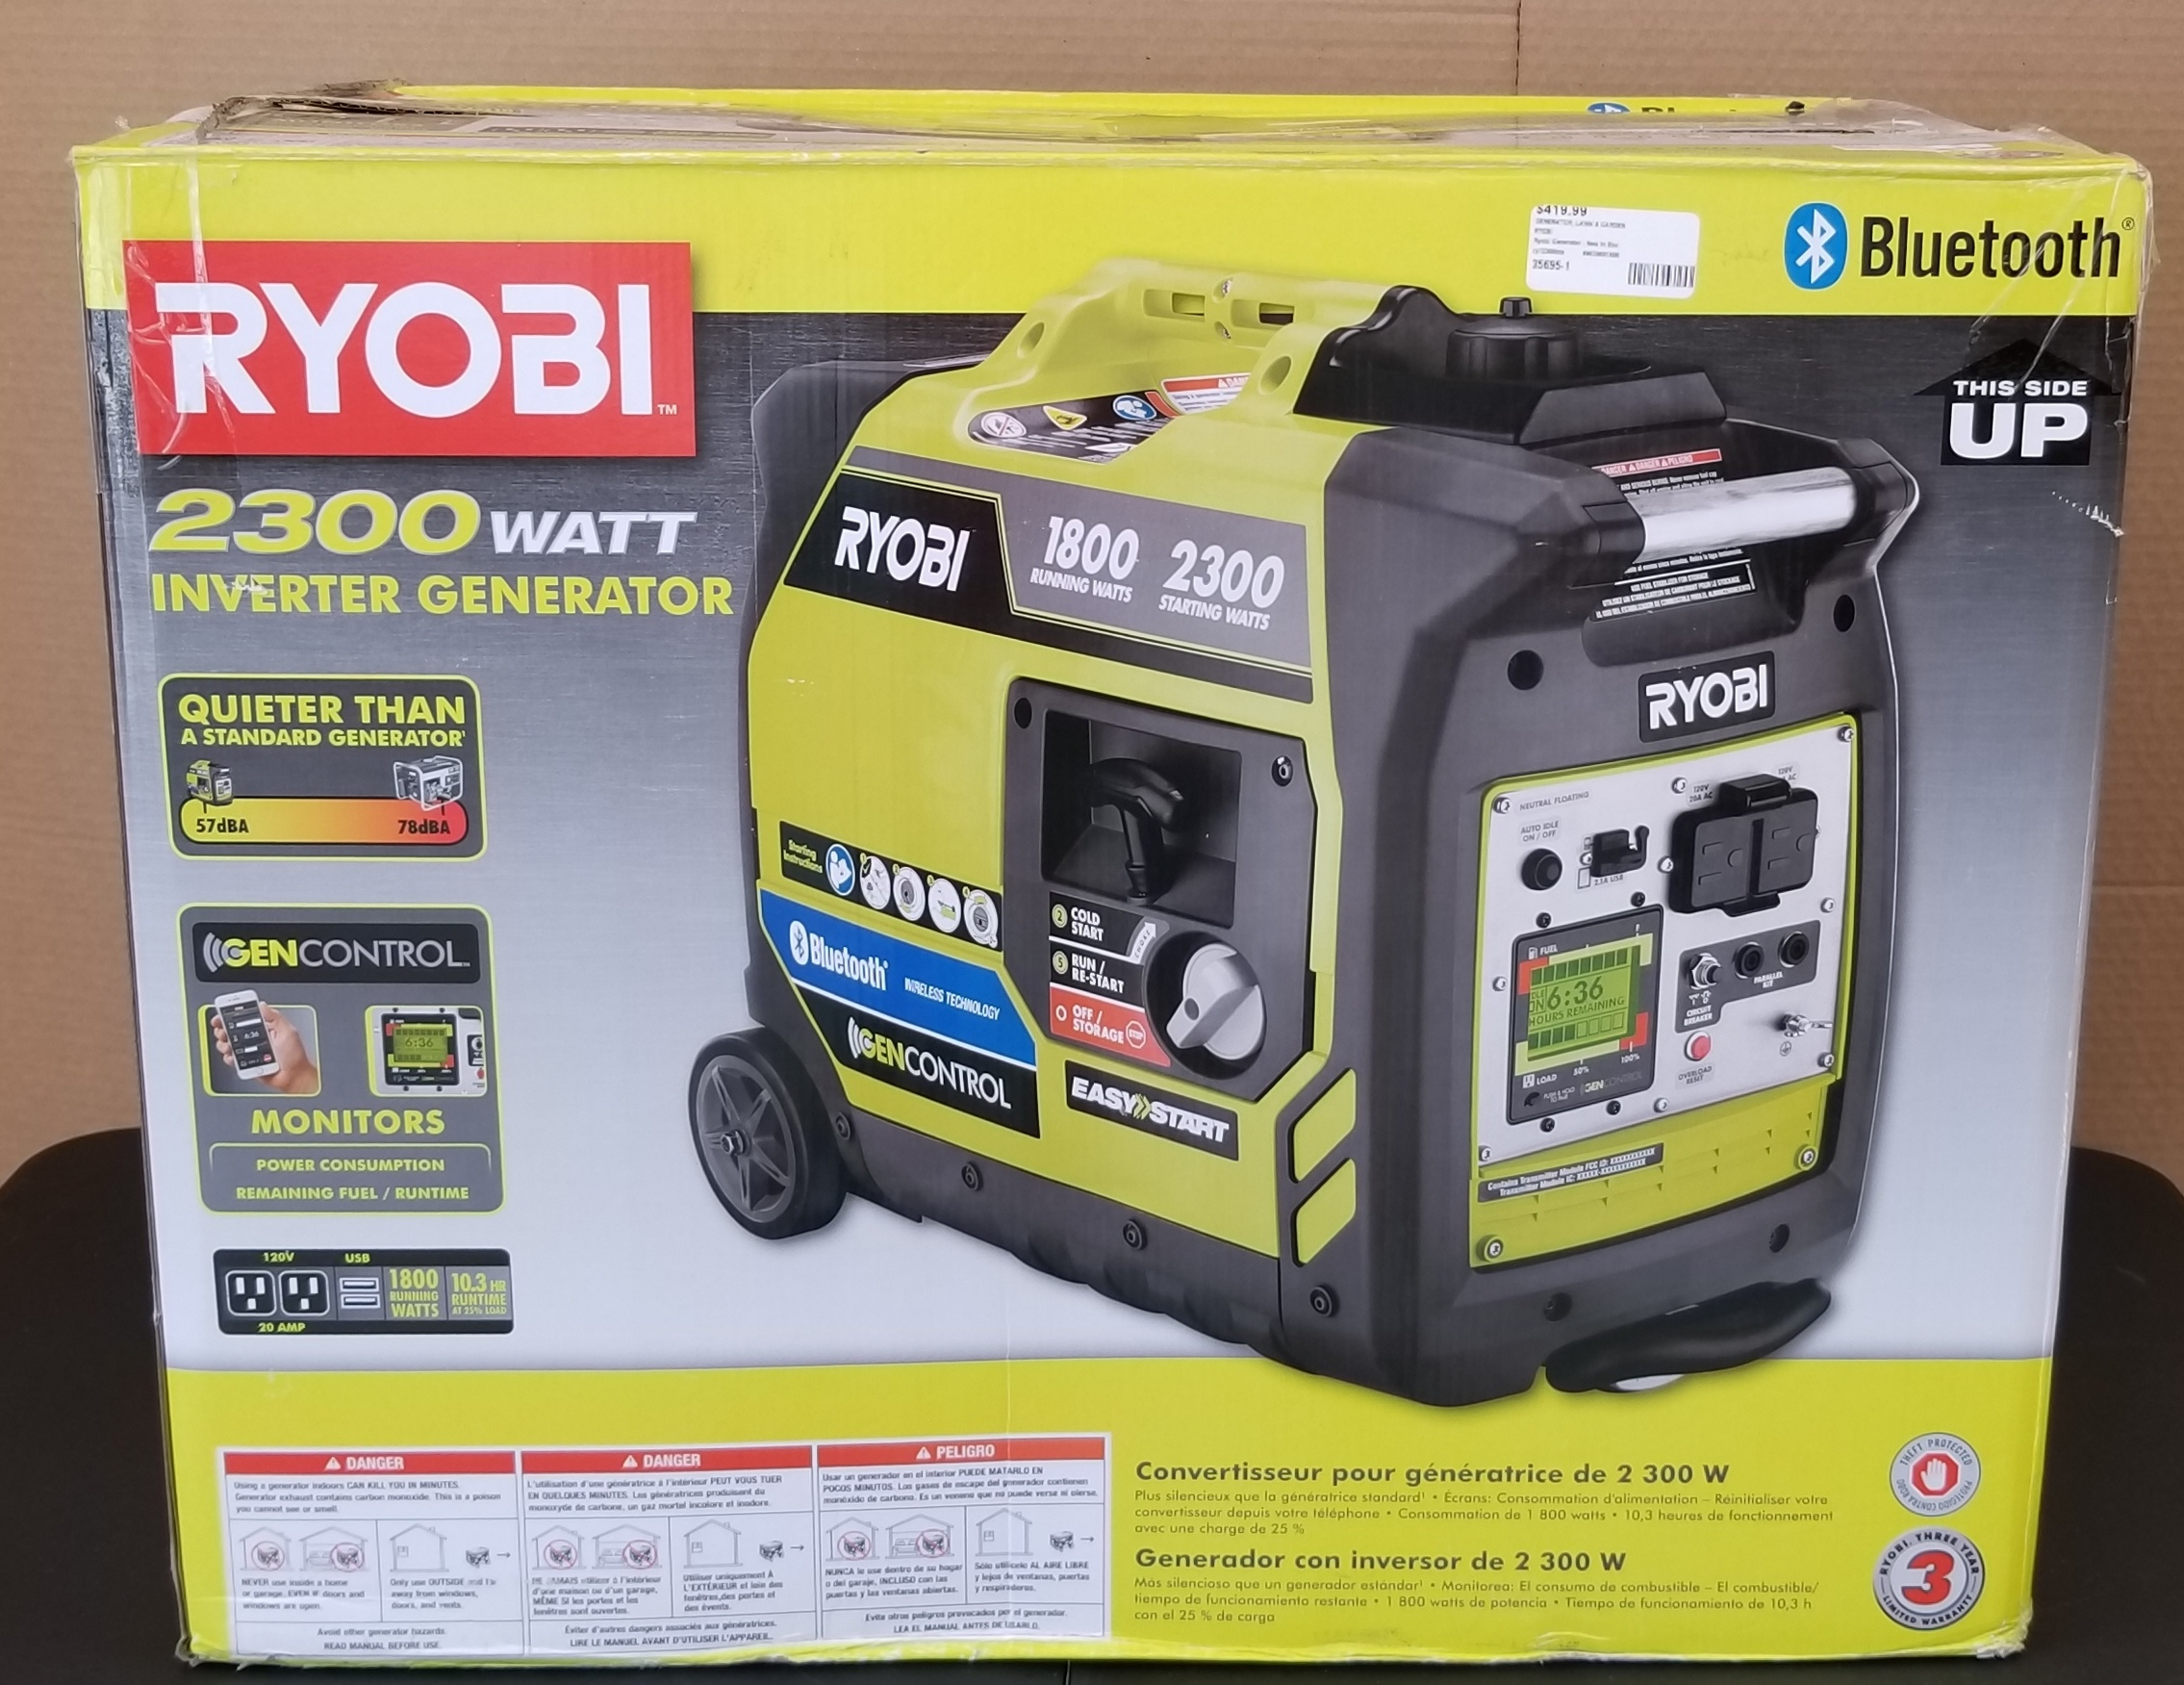 Ryobi 2300 Watt Inverter Generator/Bluetooth